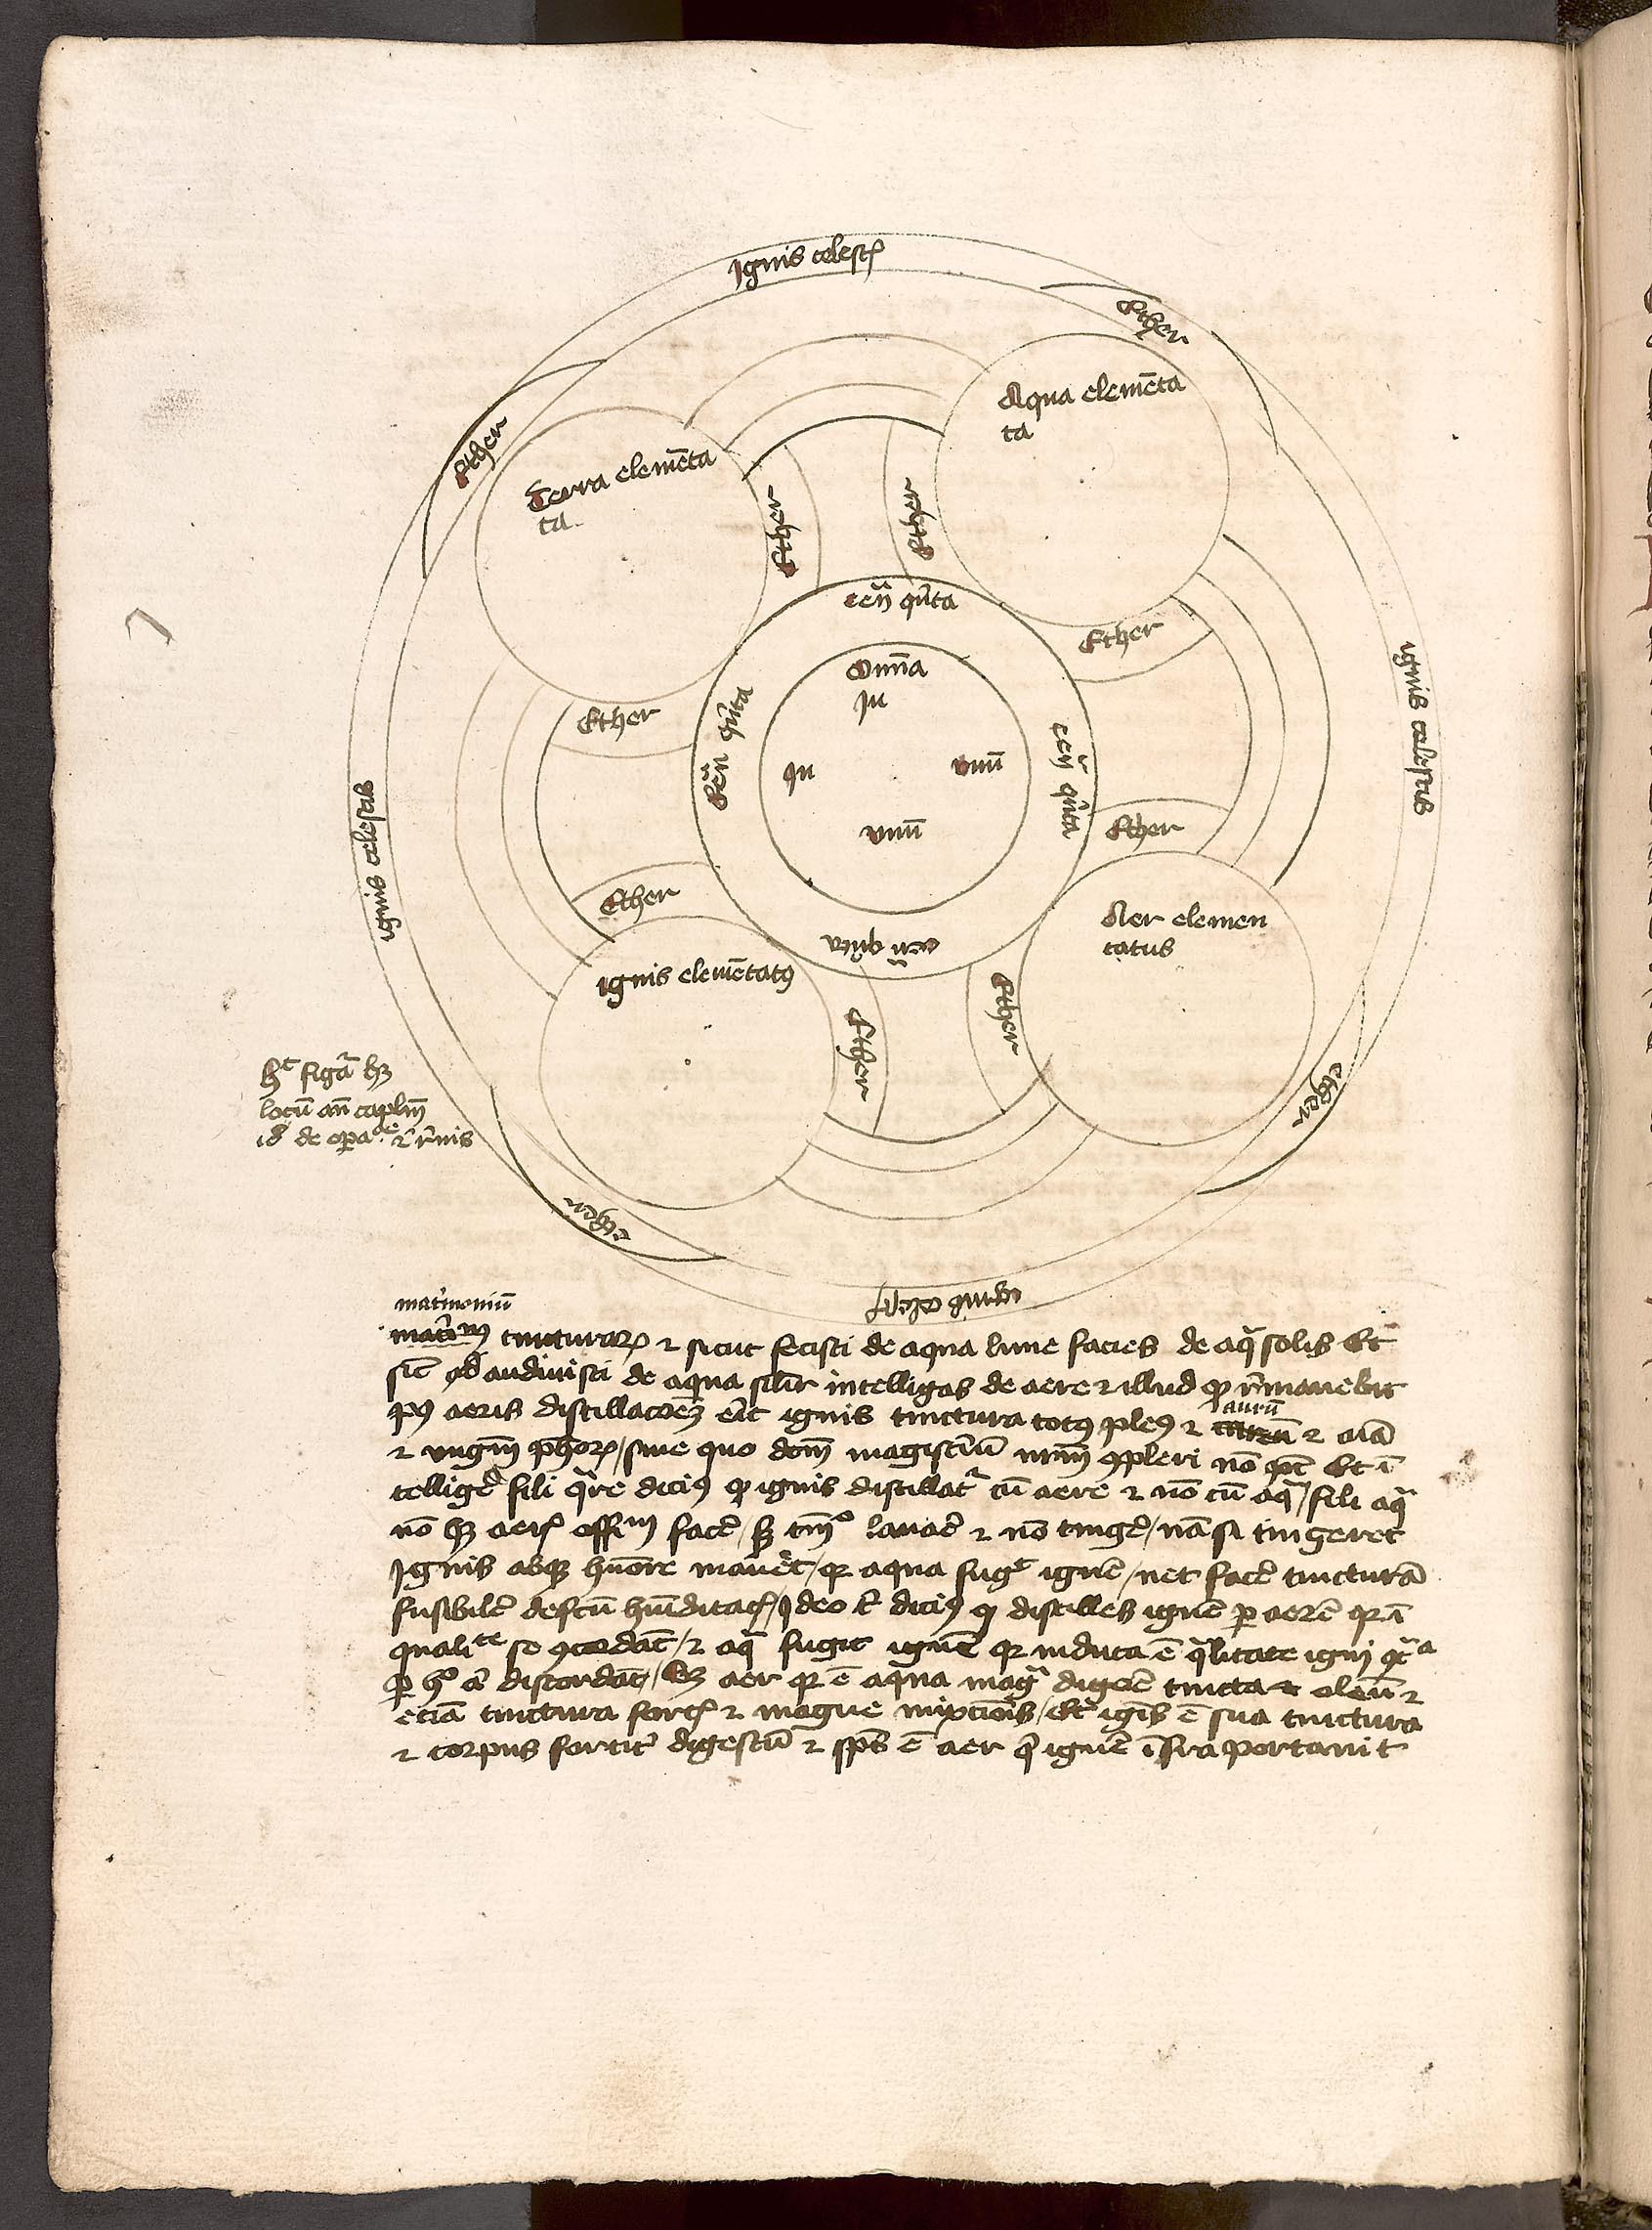 Textus alchymici